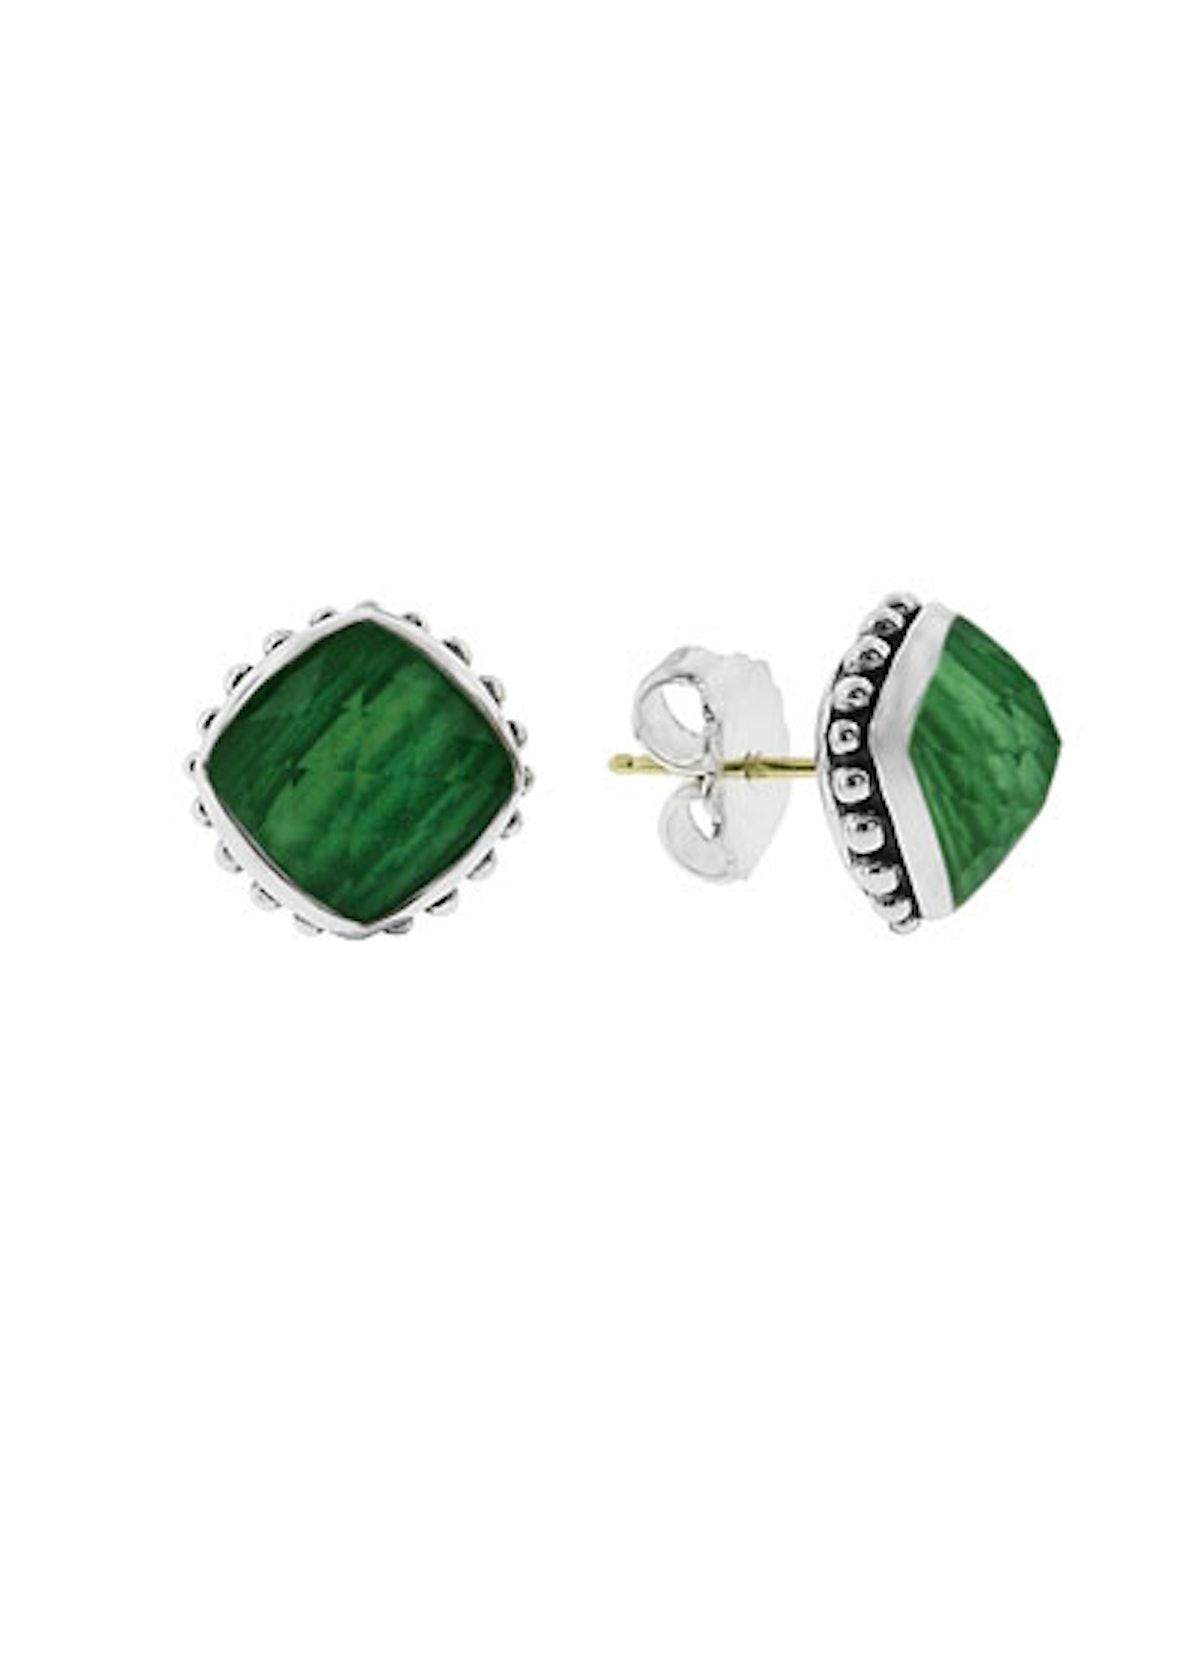 acss-malachite-jewelry-06-v.jpg